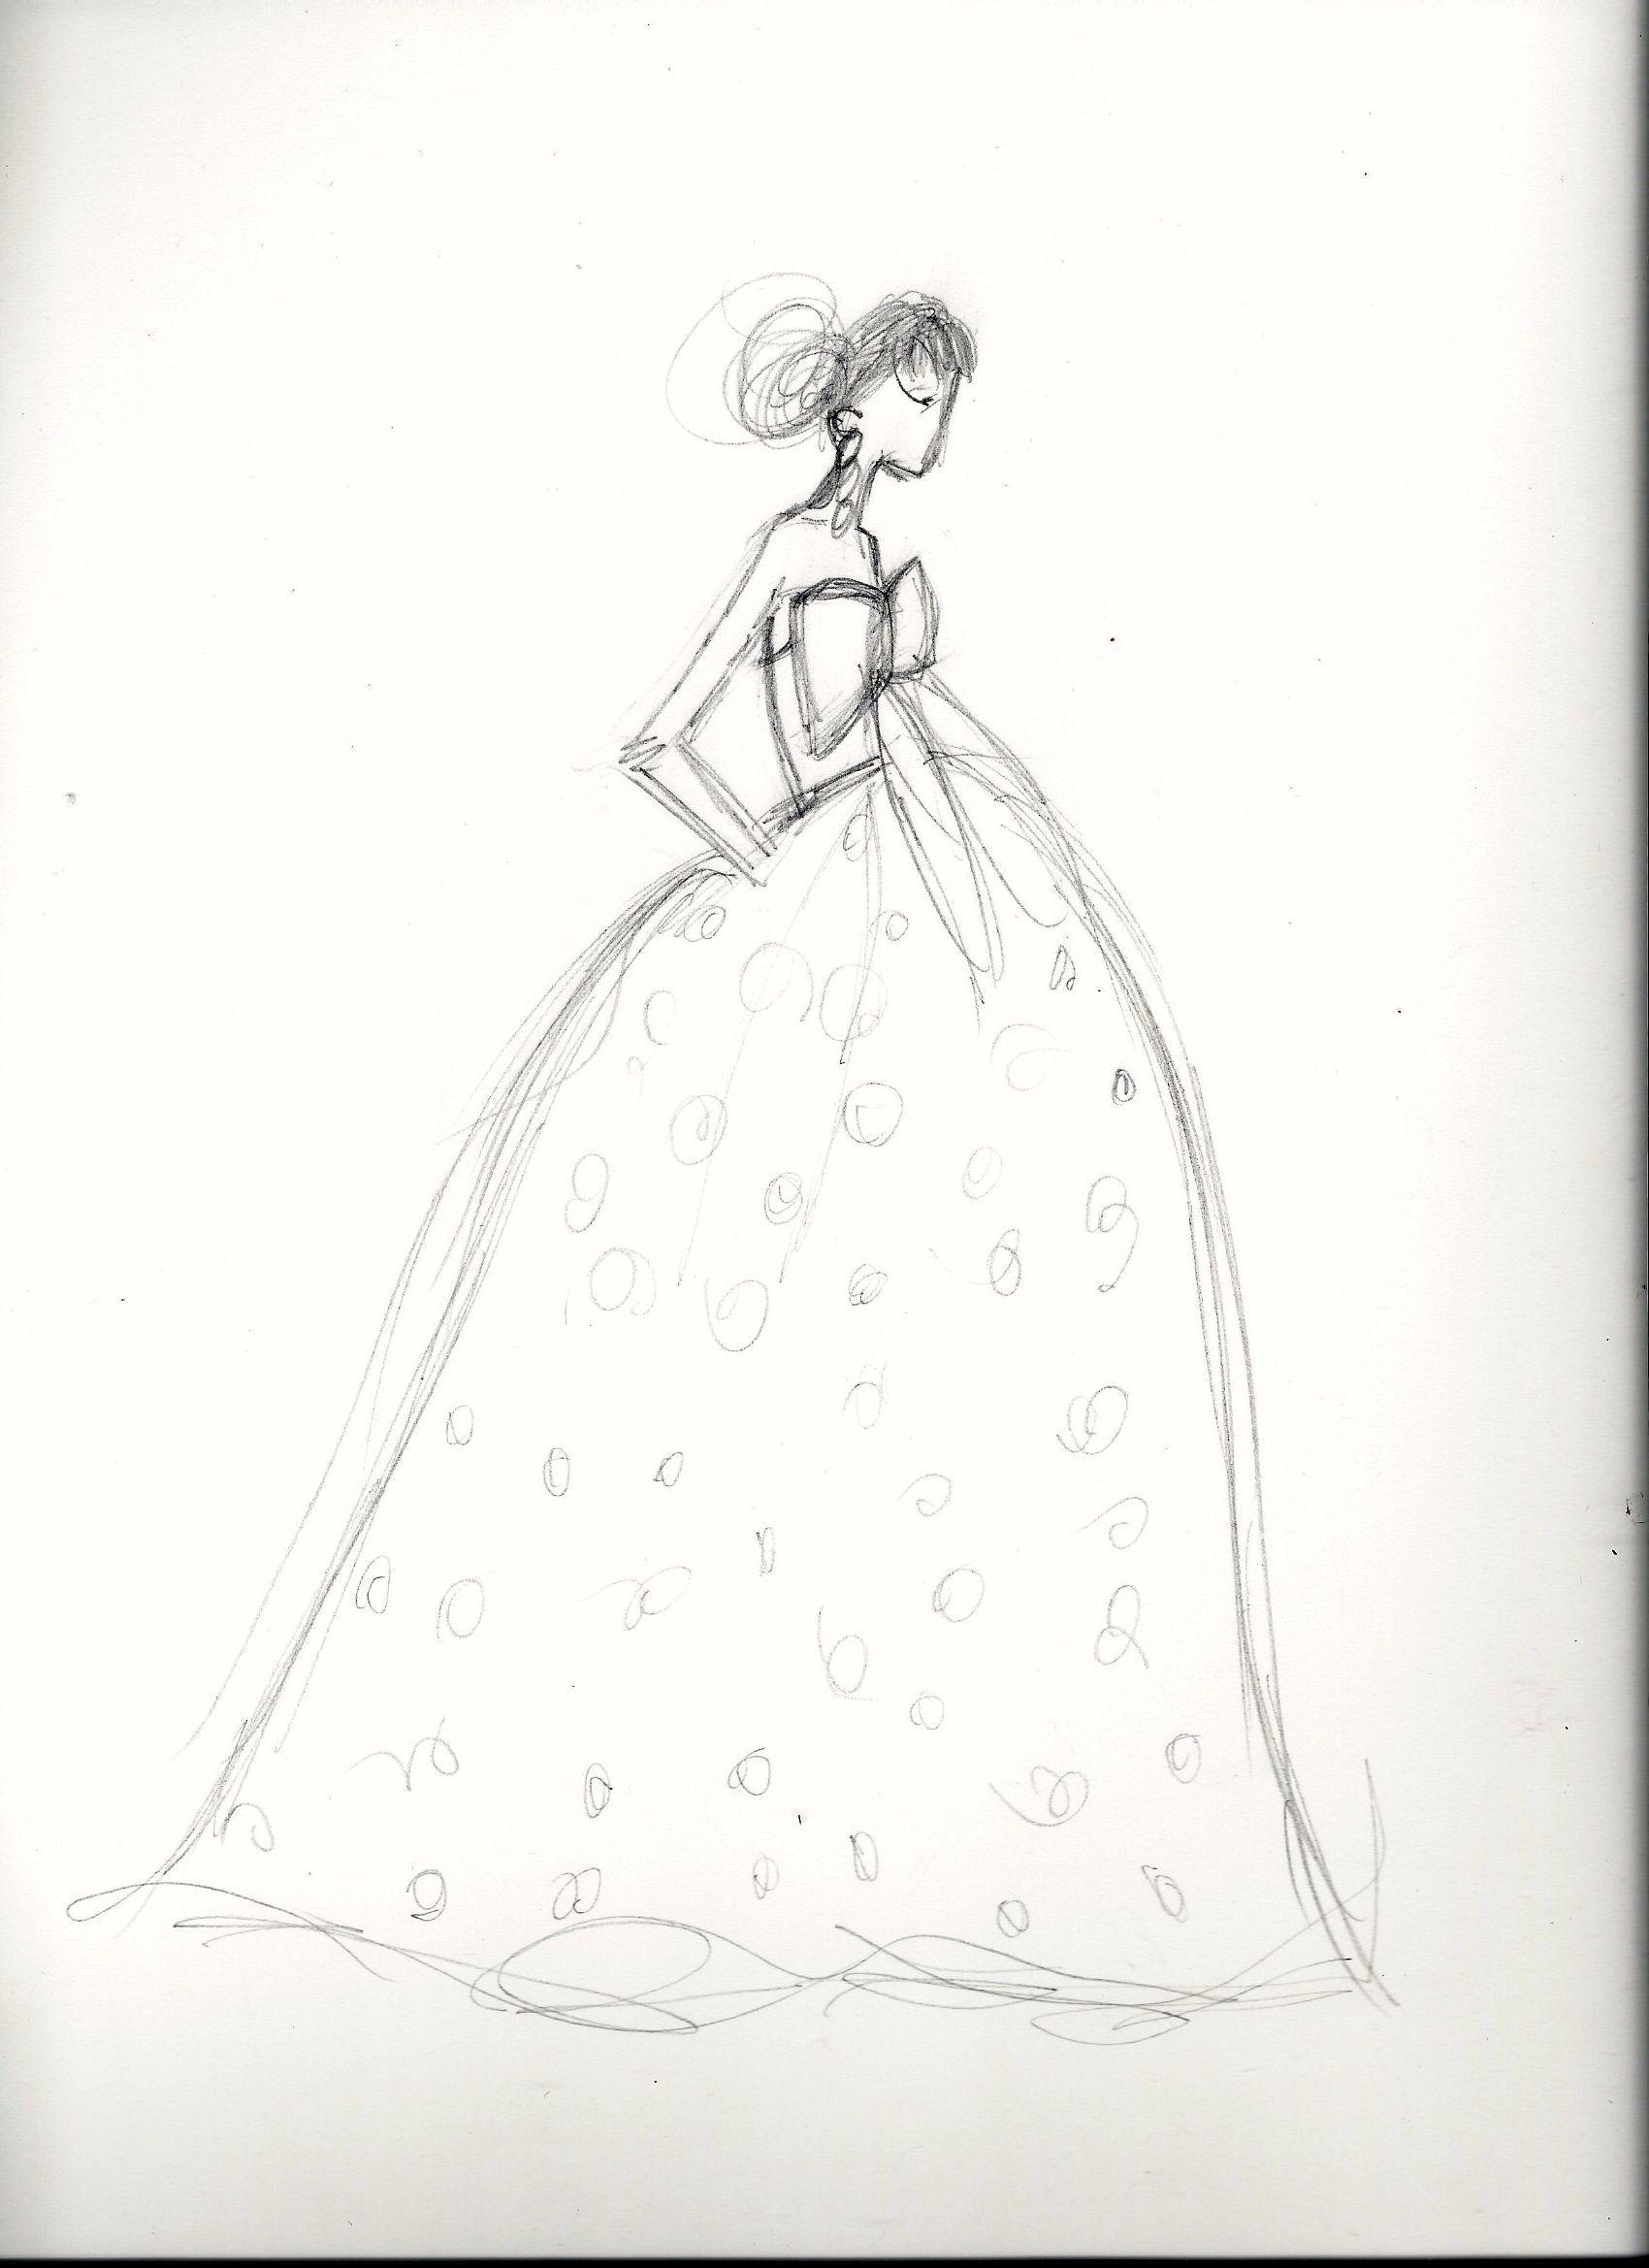 FINAL embellishment/watercolor Melissa Nadine fashion illustration - image 2 - student project